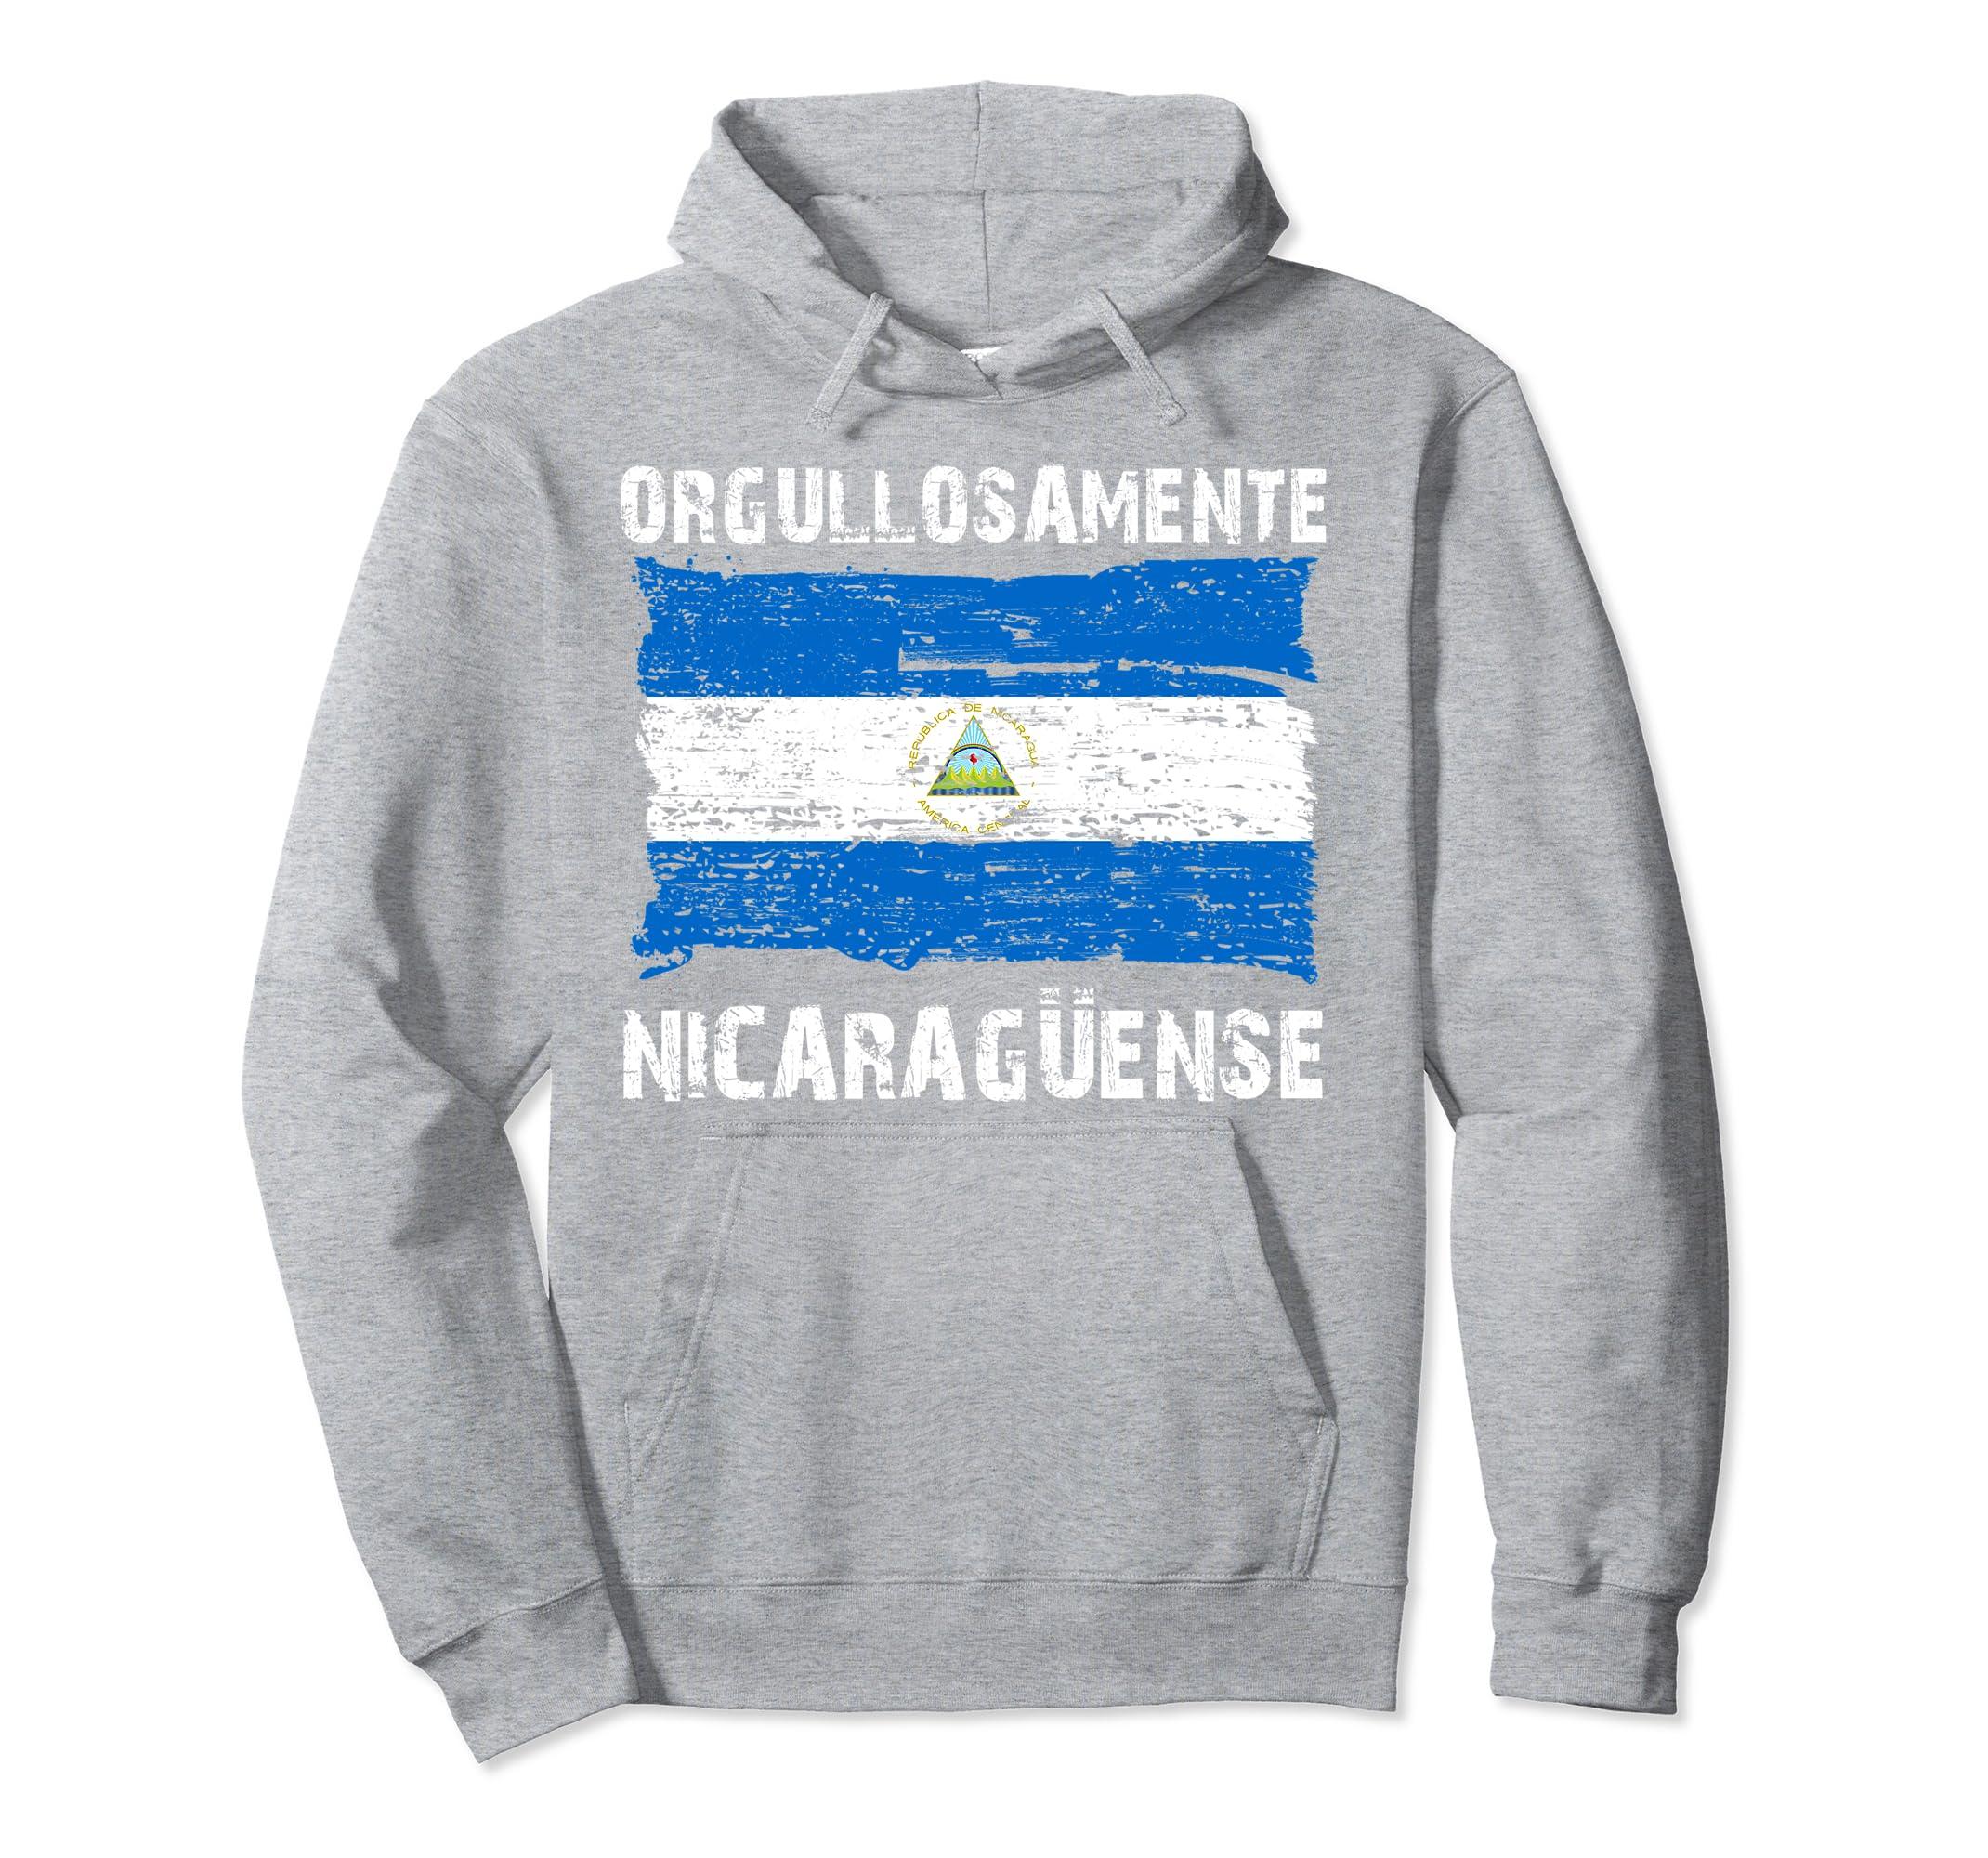 Amazon.com: Orgullosamente Nicaraguense Sudadera para hombres y mujeres: Clothing